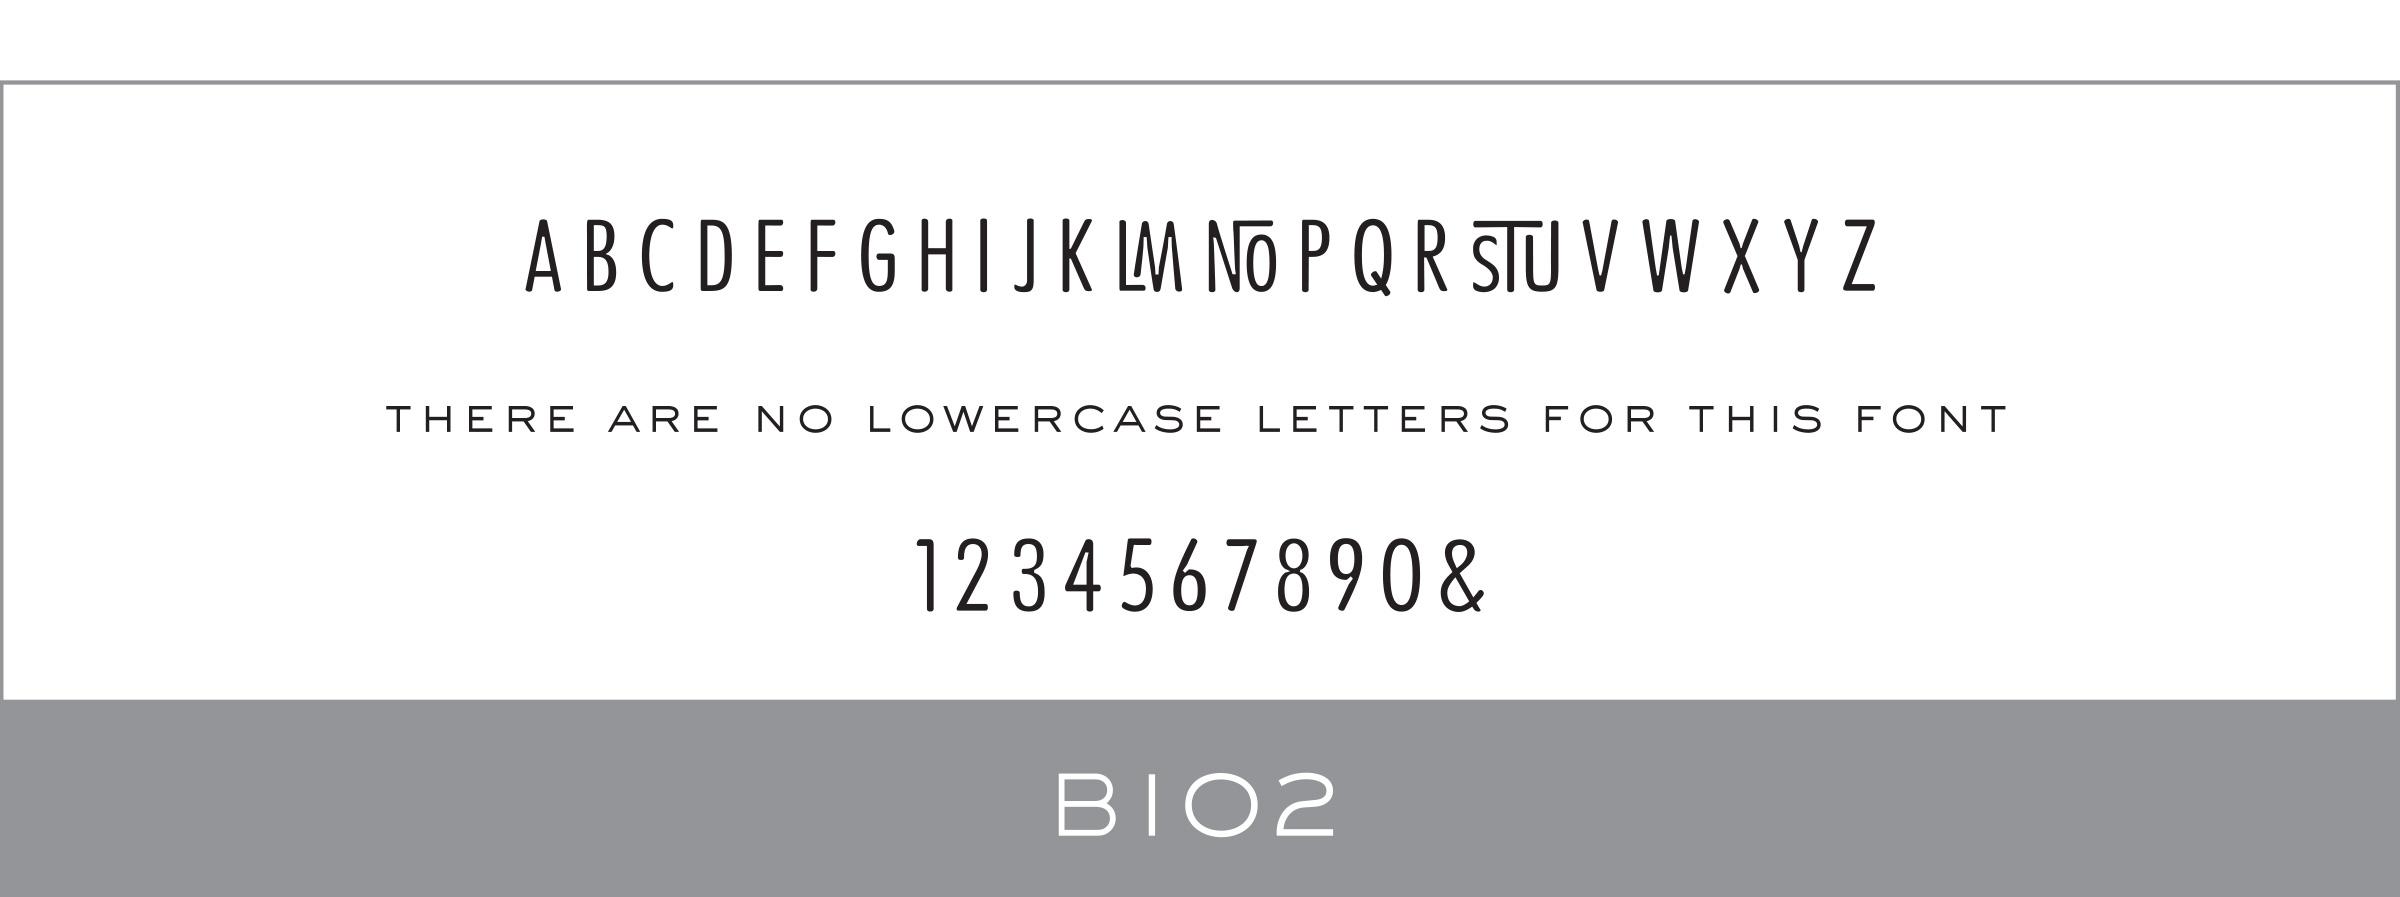 B102_Haute_Papier_Font.jpg